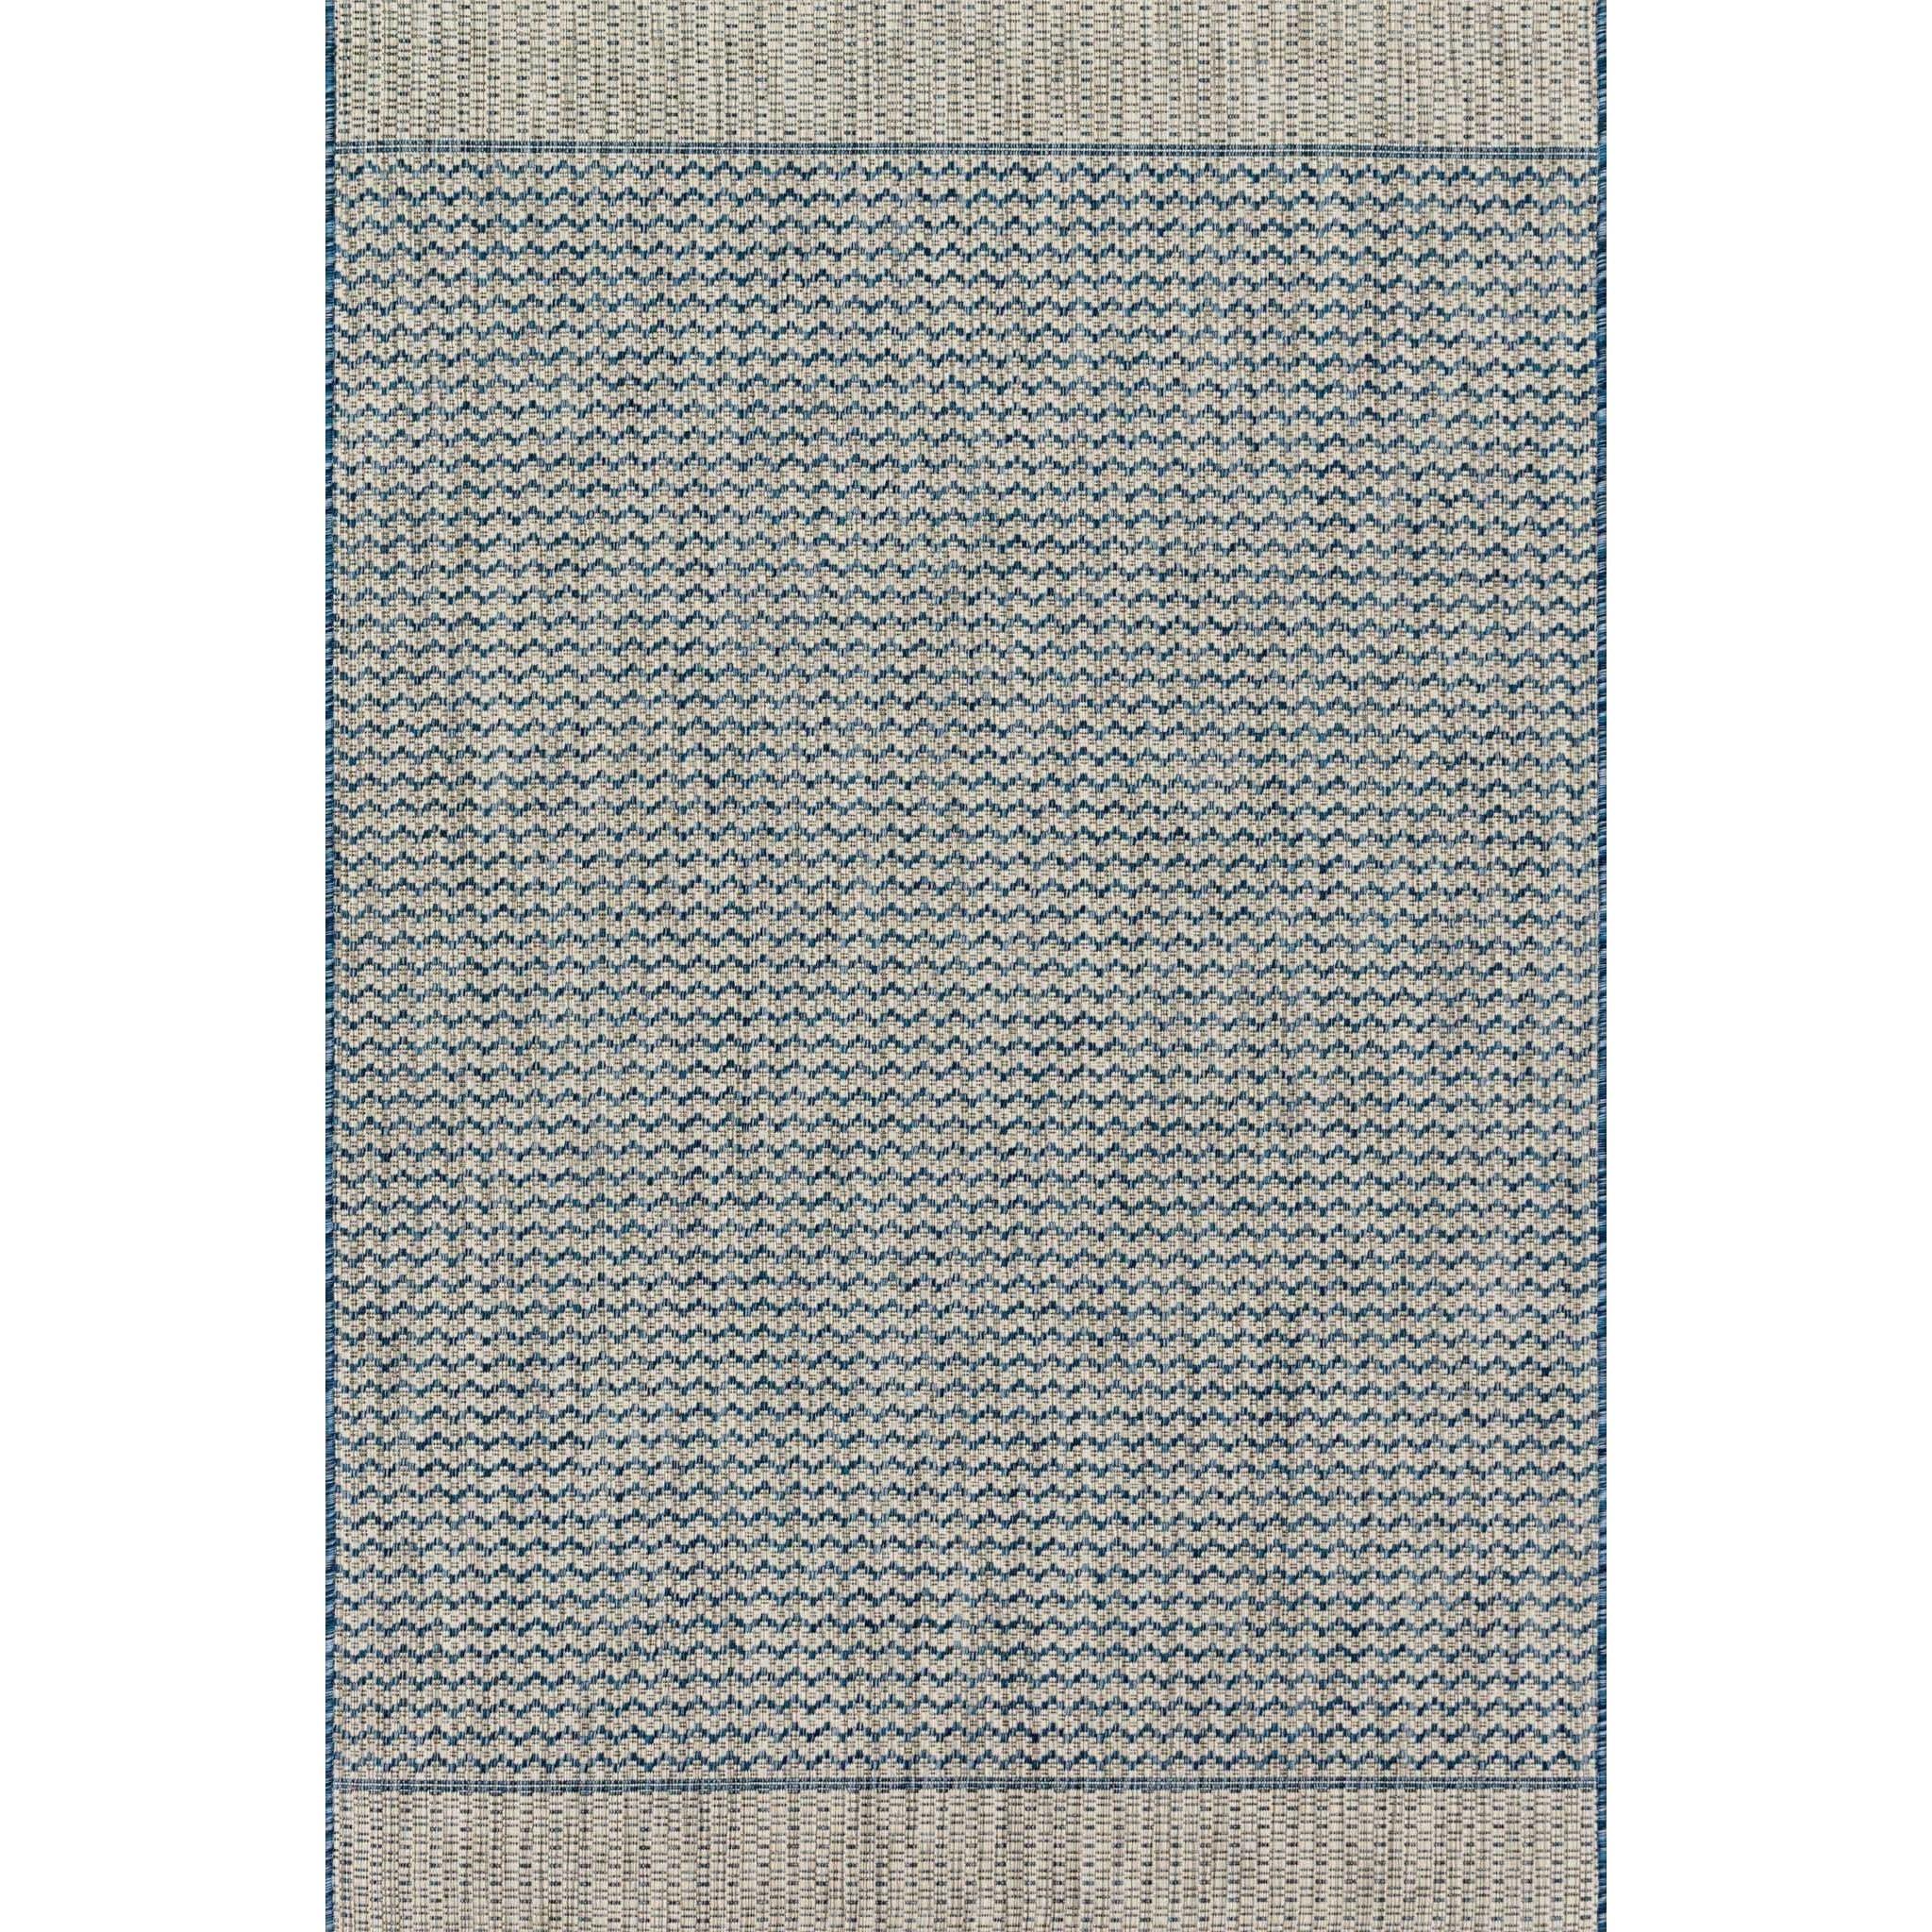 "Isle 3'-11"" X 5'-10"" Area Rug by Loloi Rugs at Sprintz Furniture"